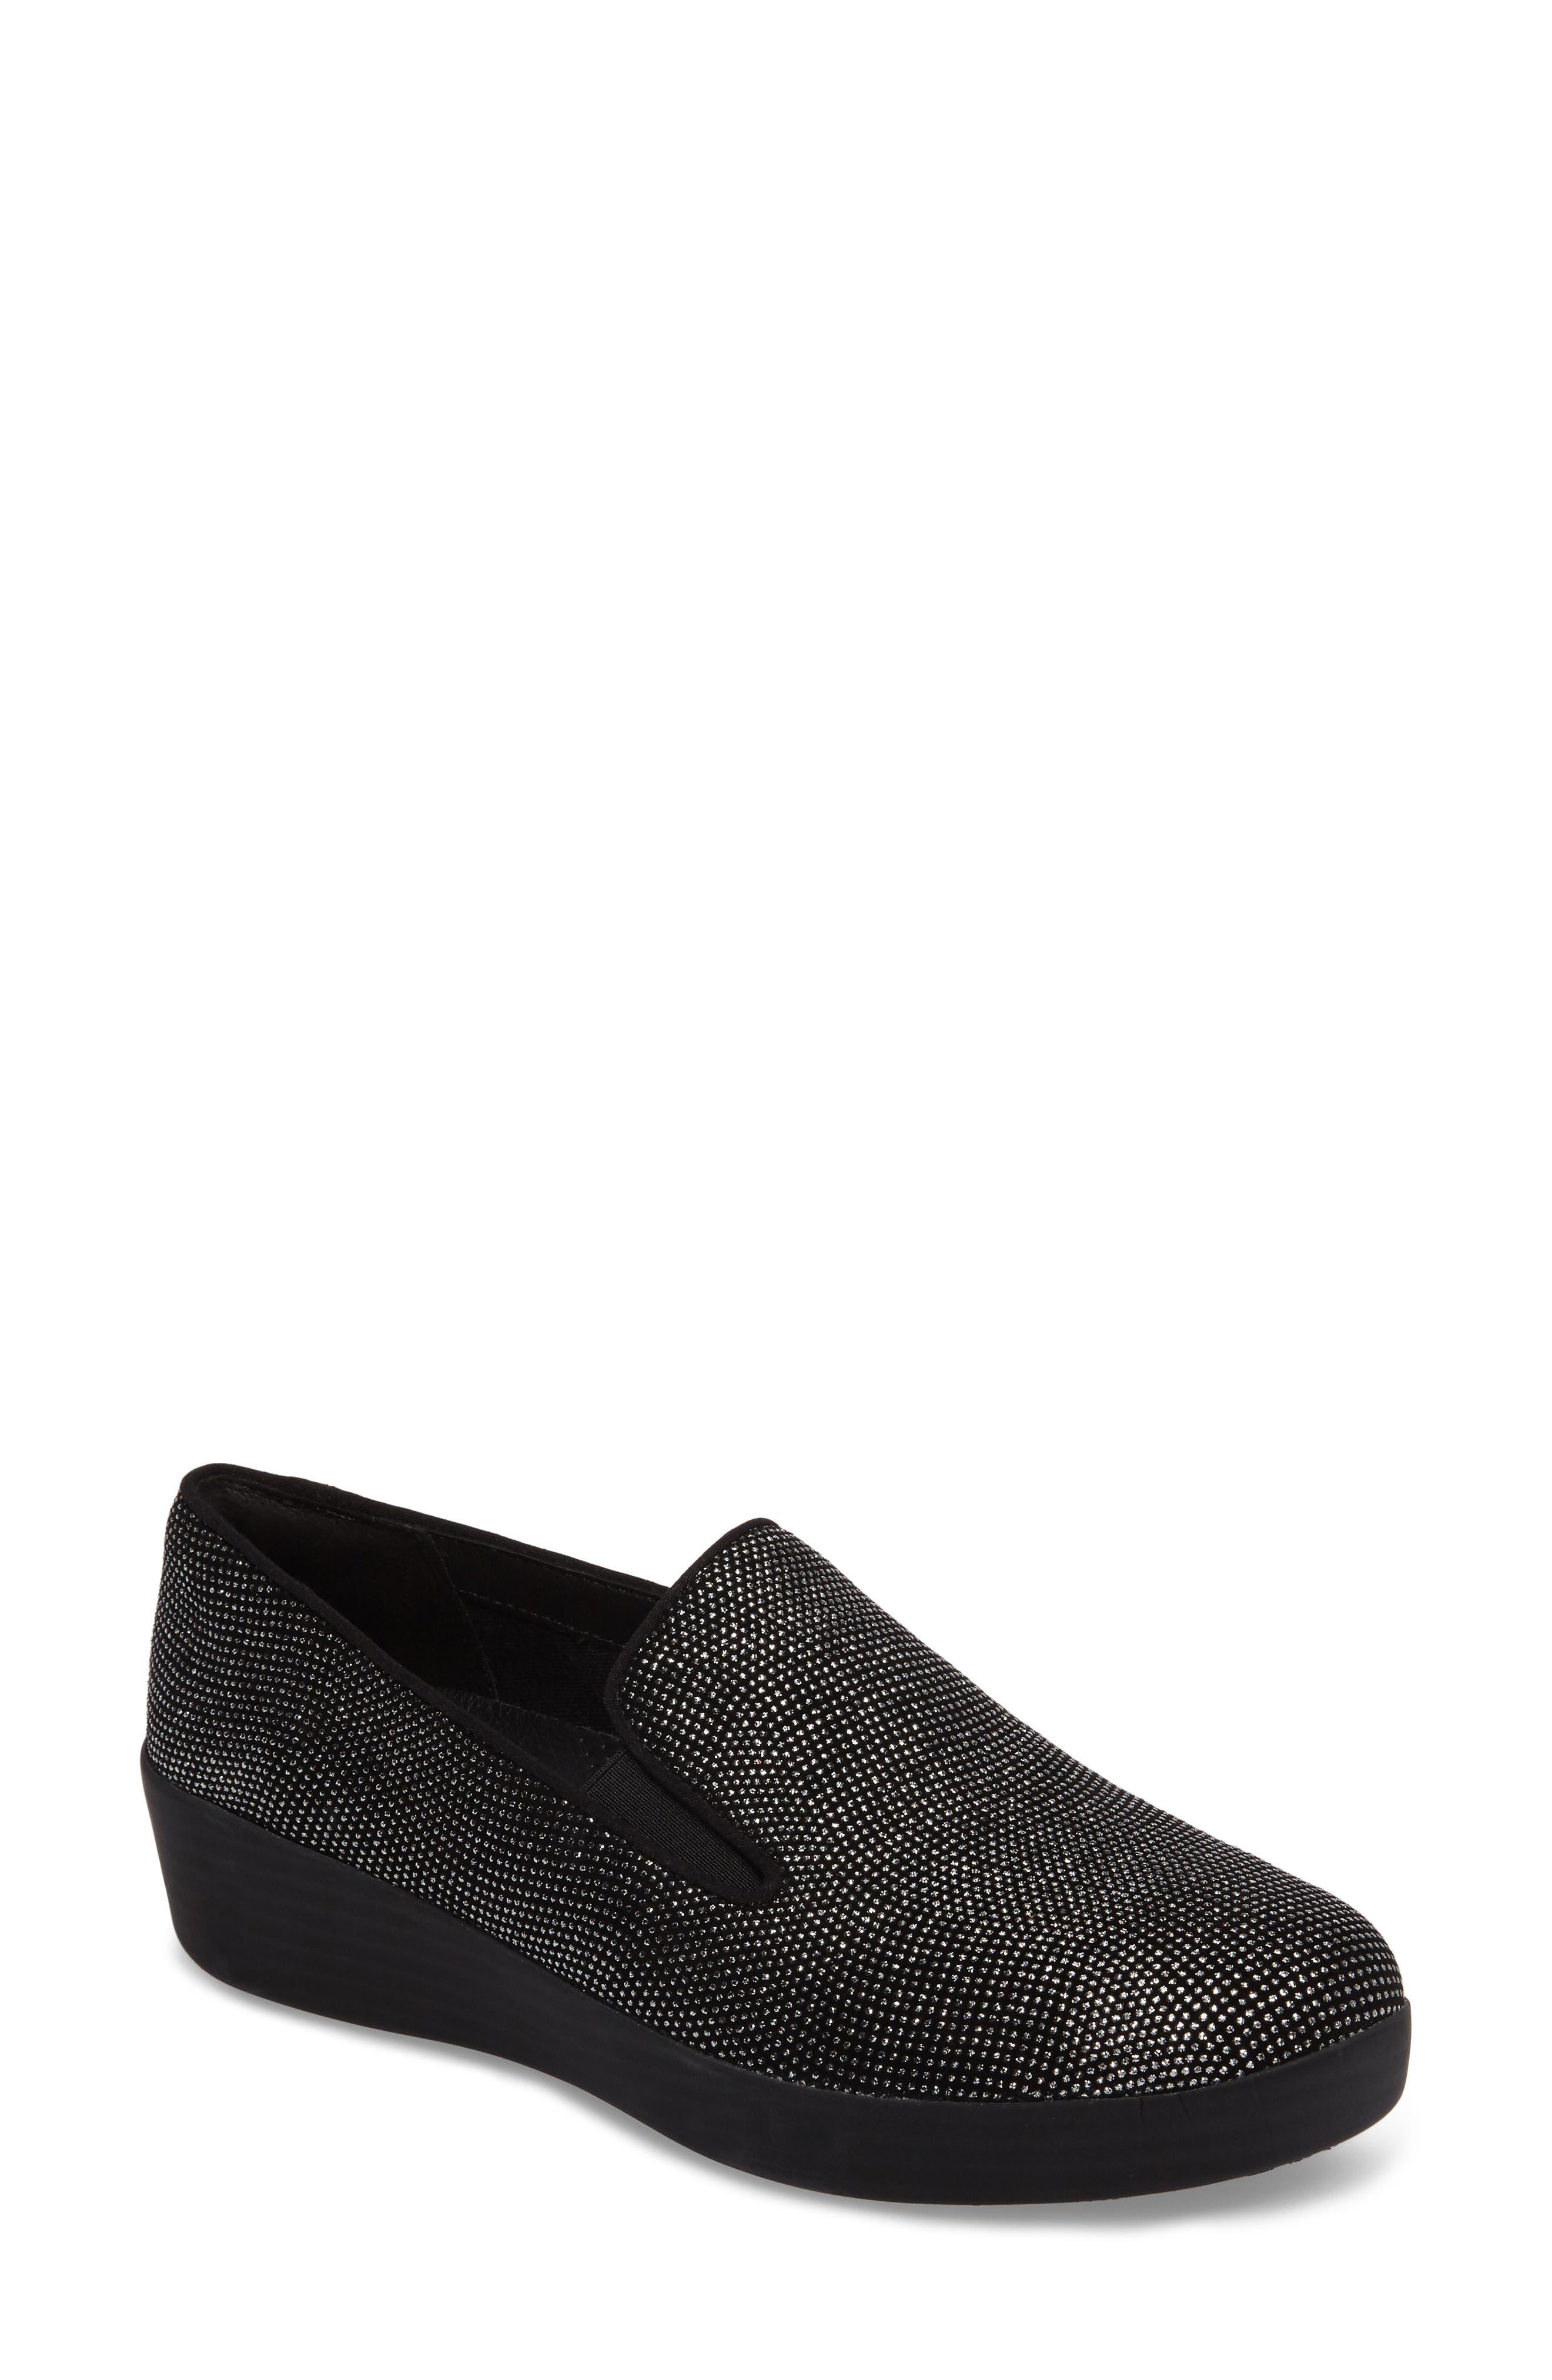 Superskate Glitter Dot Slip-On Sneaker,                         Main,                         color, Black Glimmer Suede